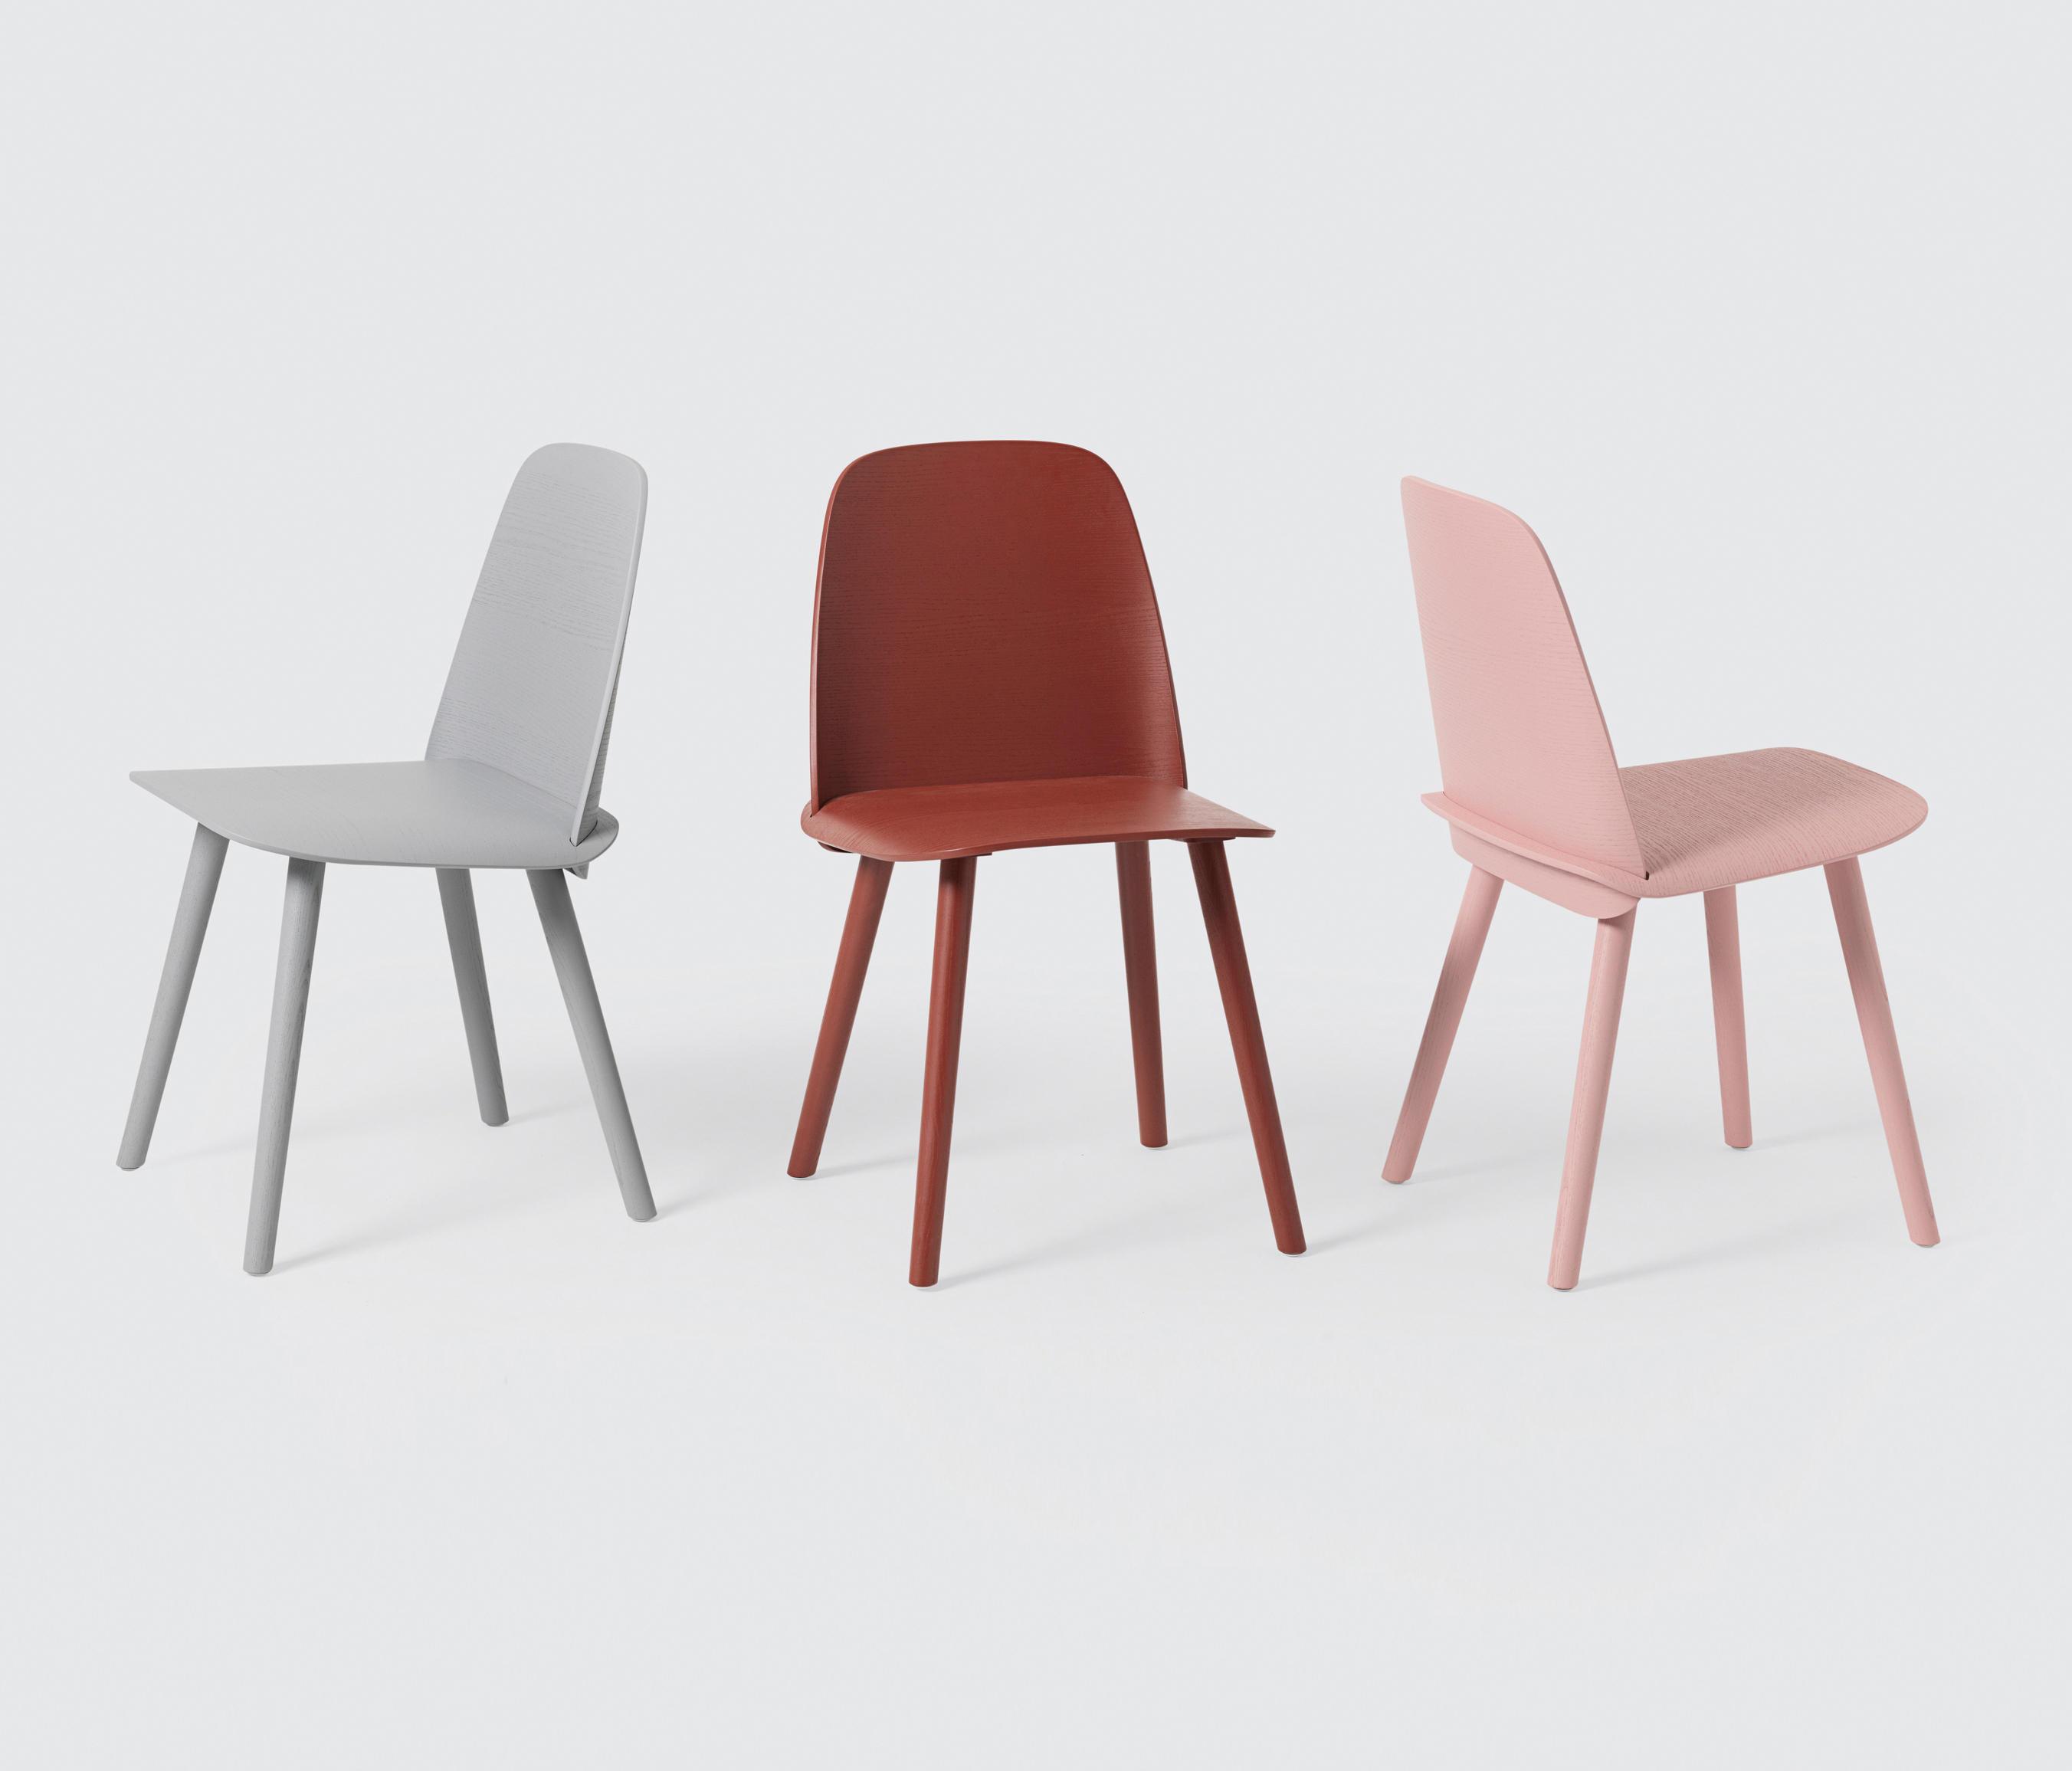 Nerd bar stool high barhocker von muuto architonic for Barhocker englisch